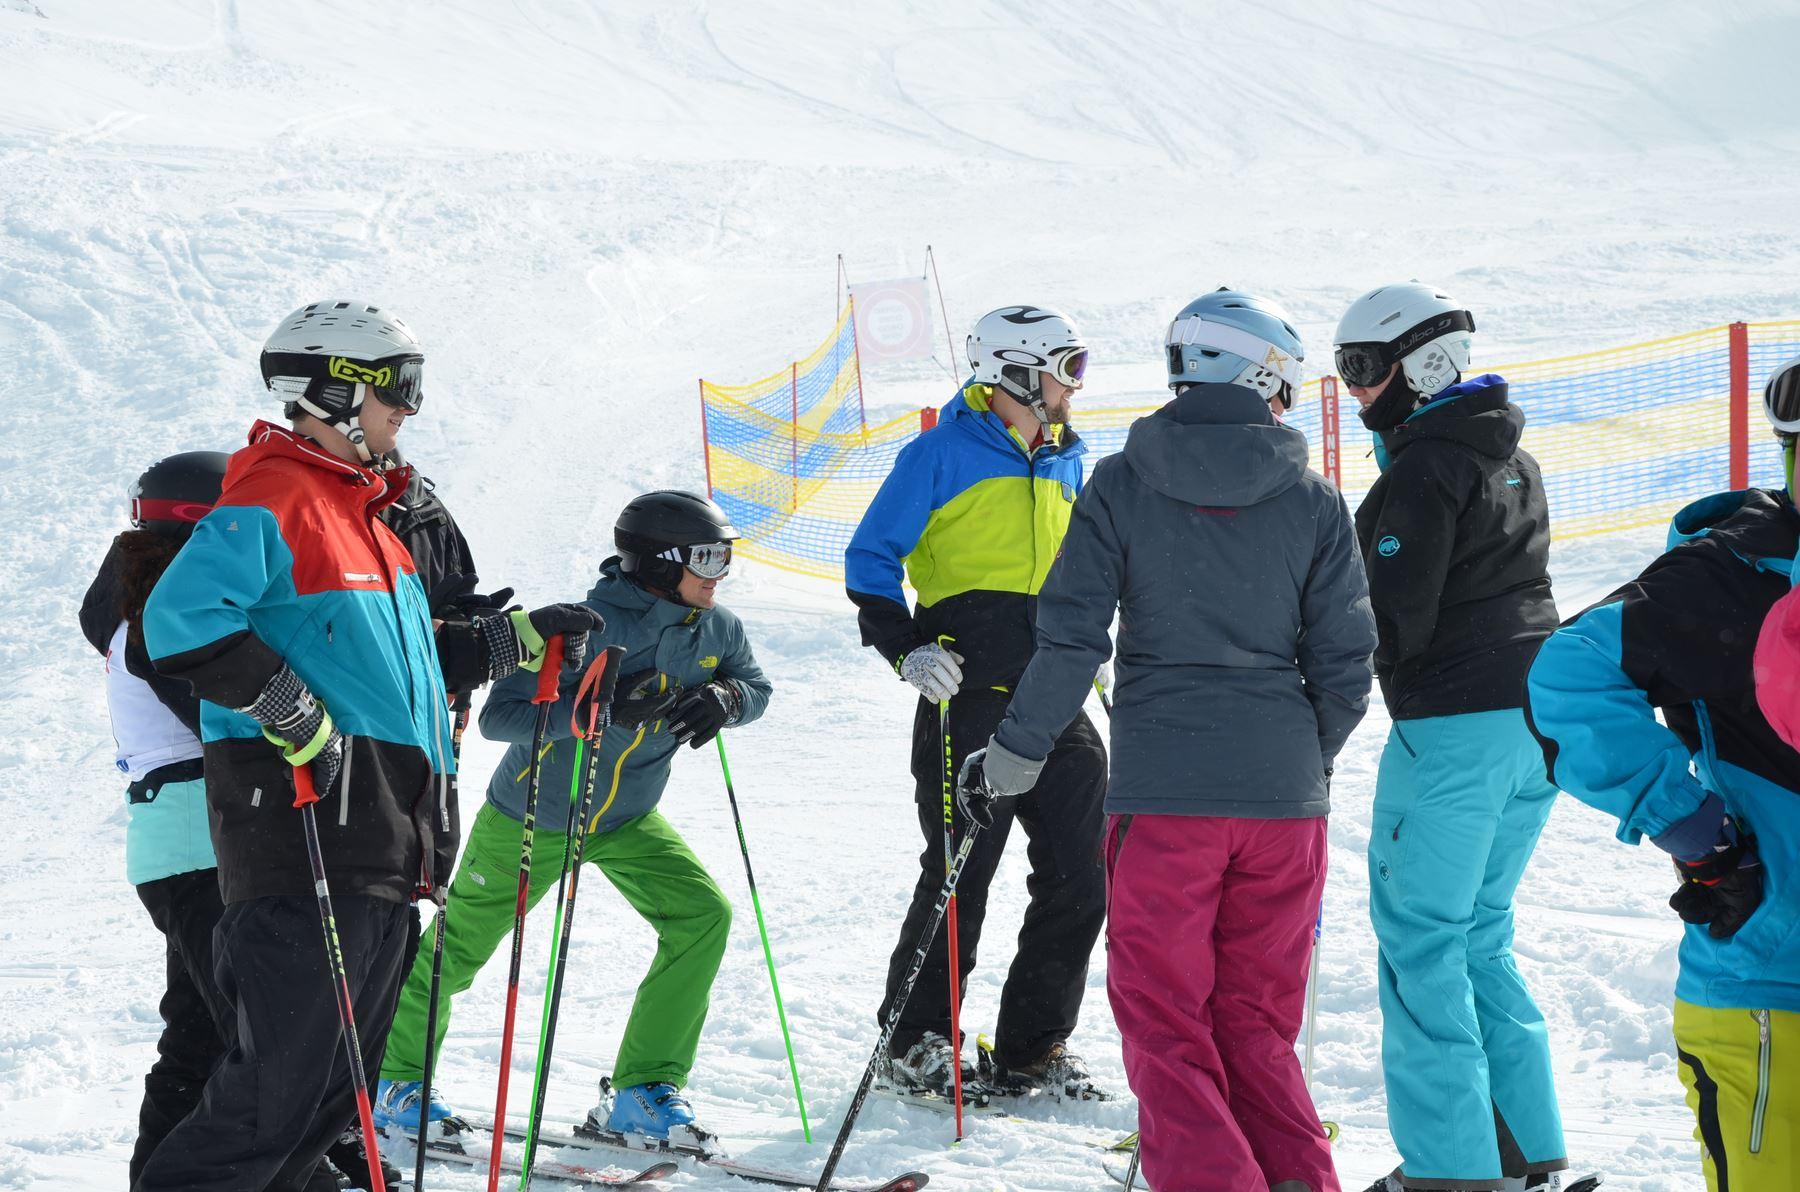 2015-03-22 BV Zillertal Skirennen 070.JPG